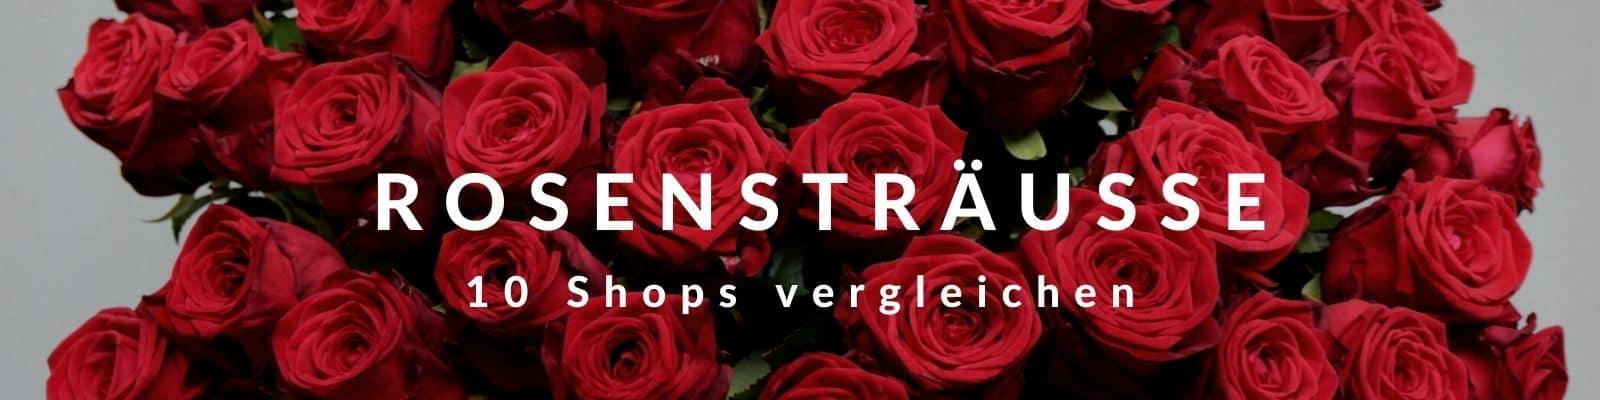 Rosenstrauß - Rosensträuße mit roten Rosen